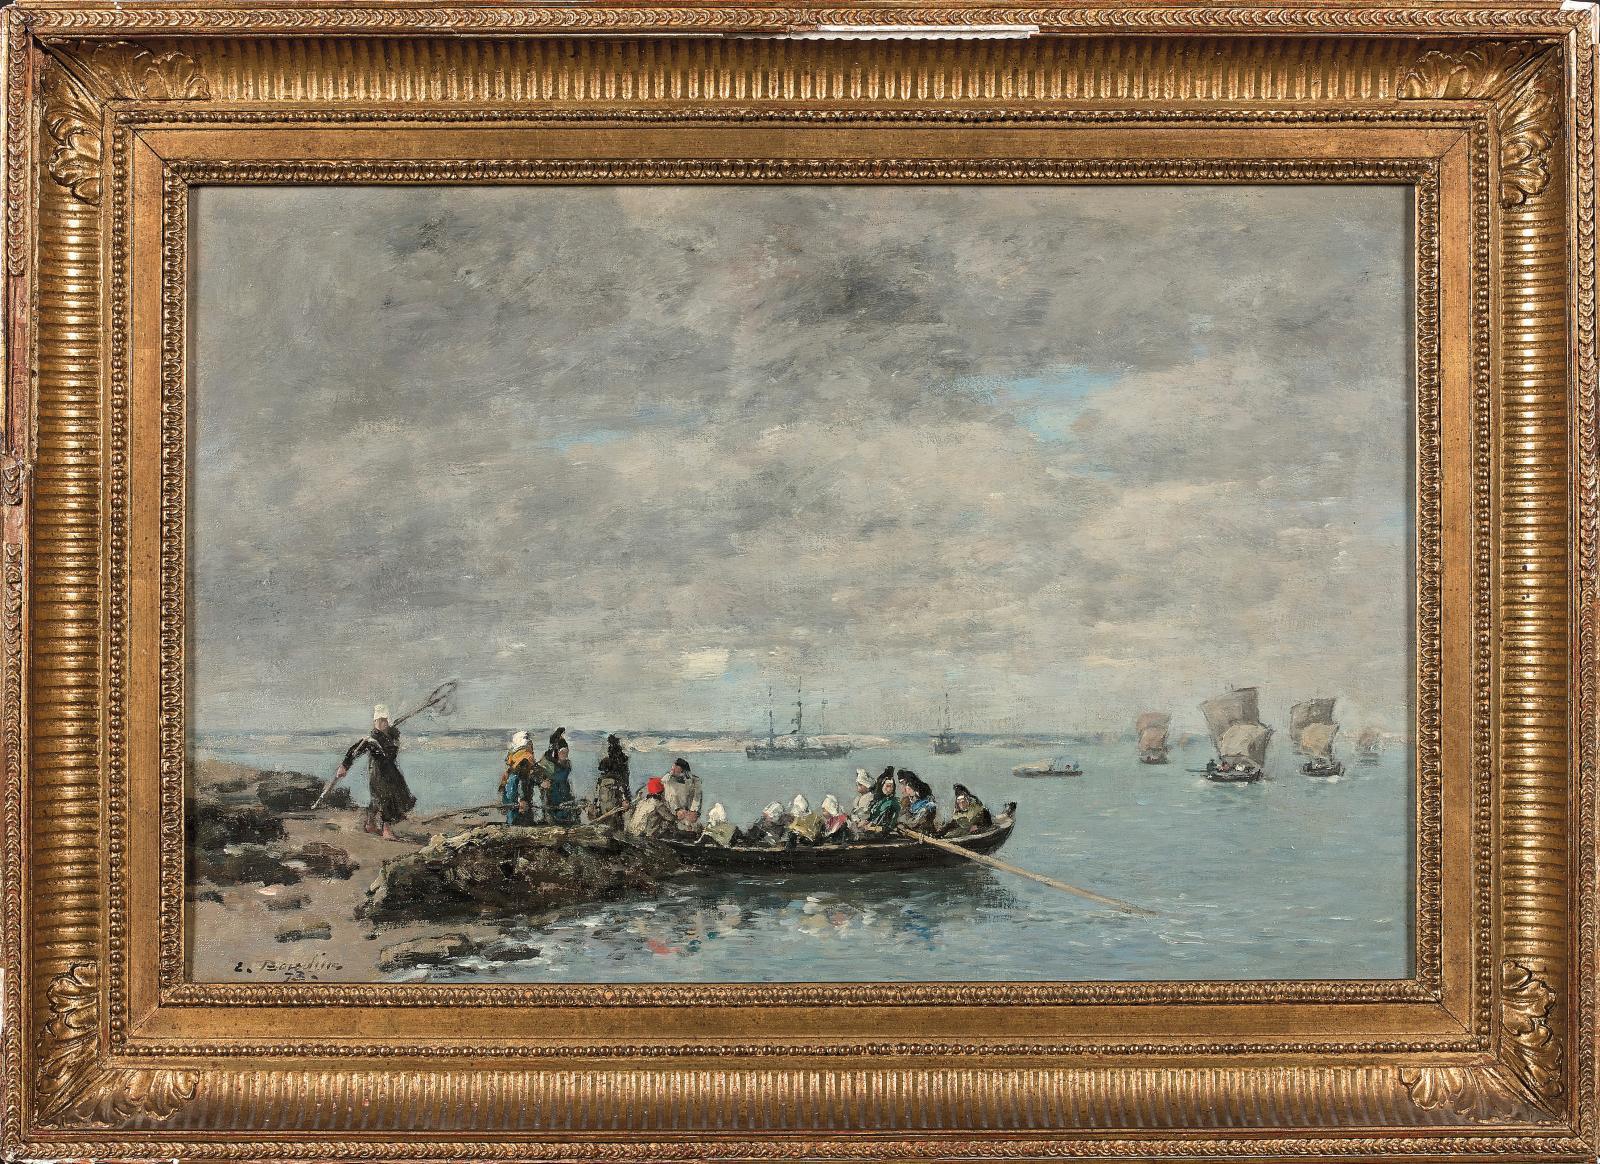 Eugène Boudin (1824-1898), Kerhor, pêcheuses (Kerhor, Fisherwomen), 1873, oil on canvas, 30.8 x 46.6 cm.Estimate: €50,000/70,000